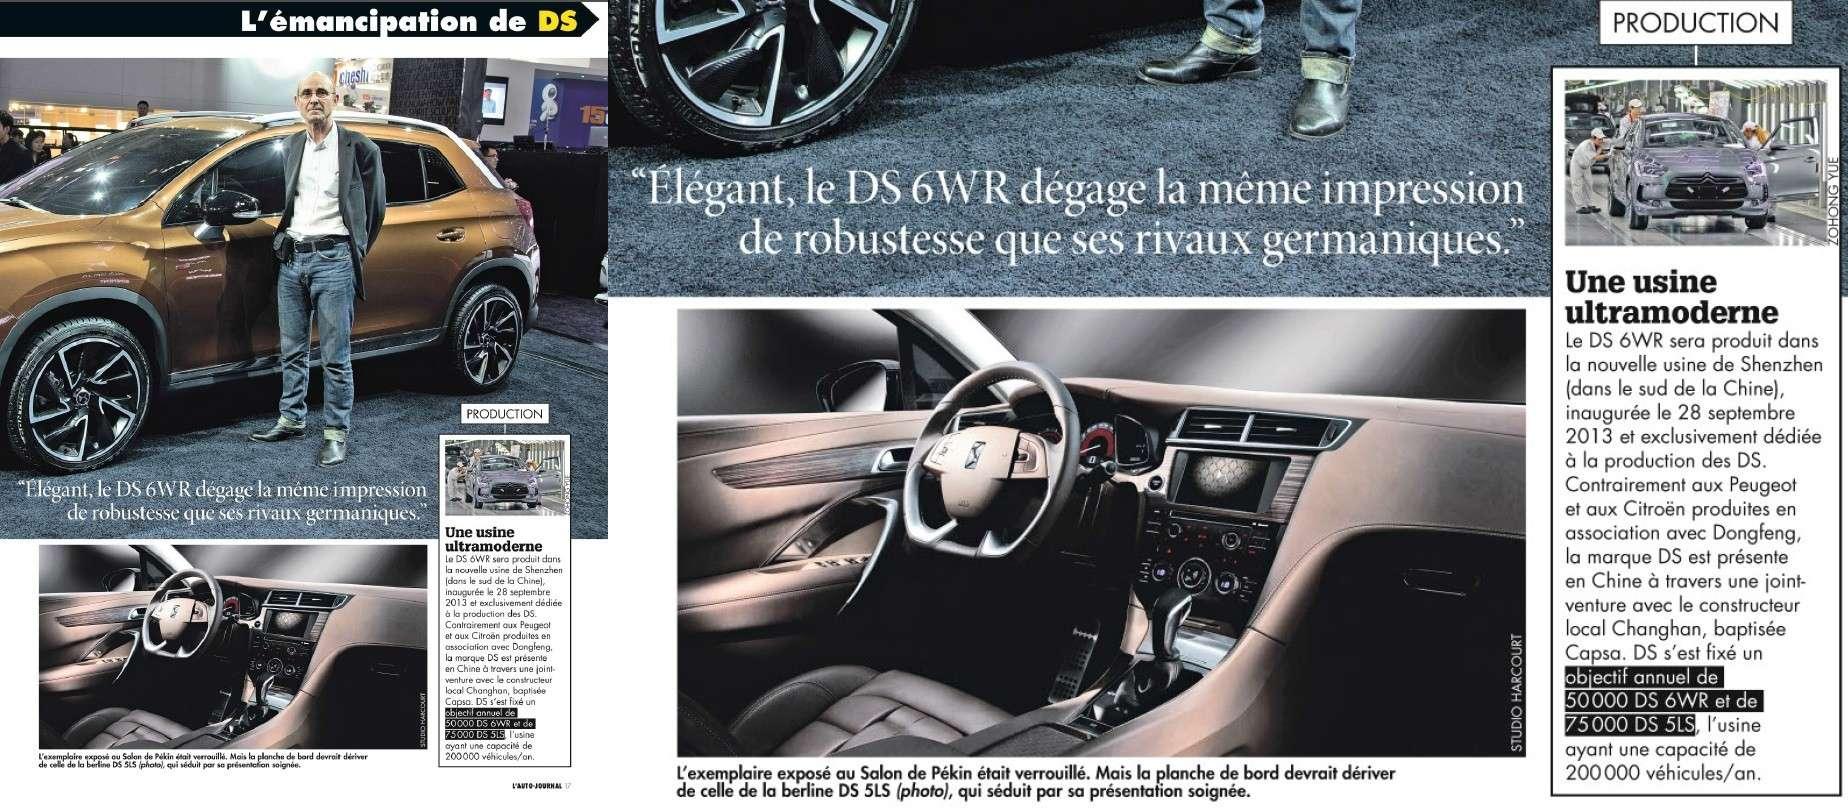 [ACTUALITE] Revue de Presse Citroën - Page 12 410